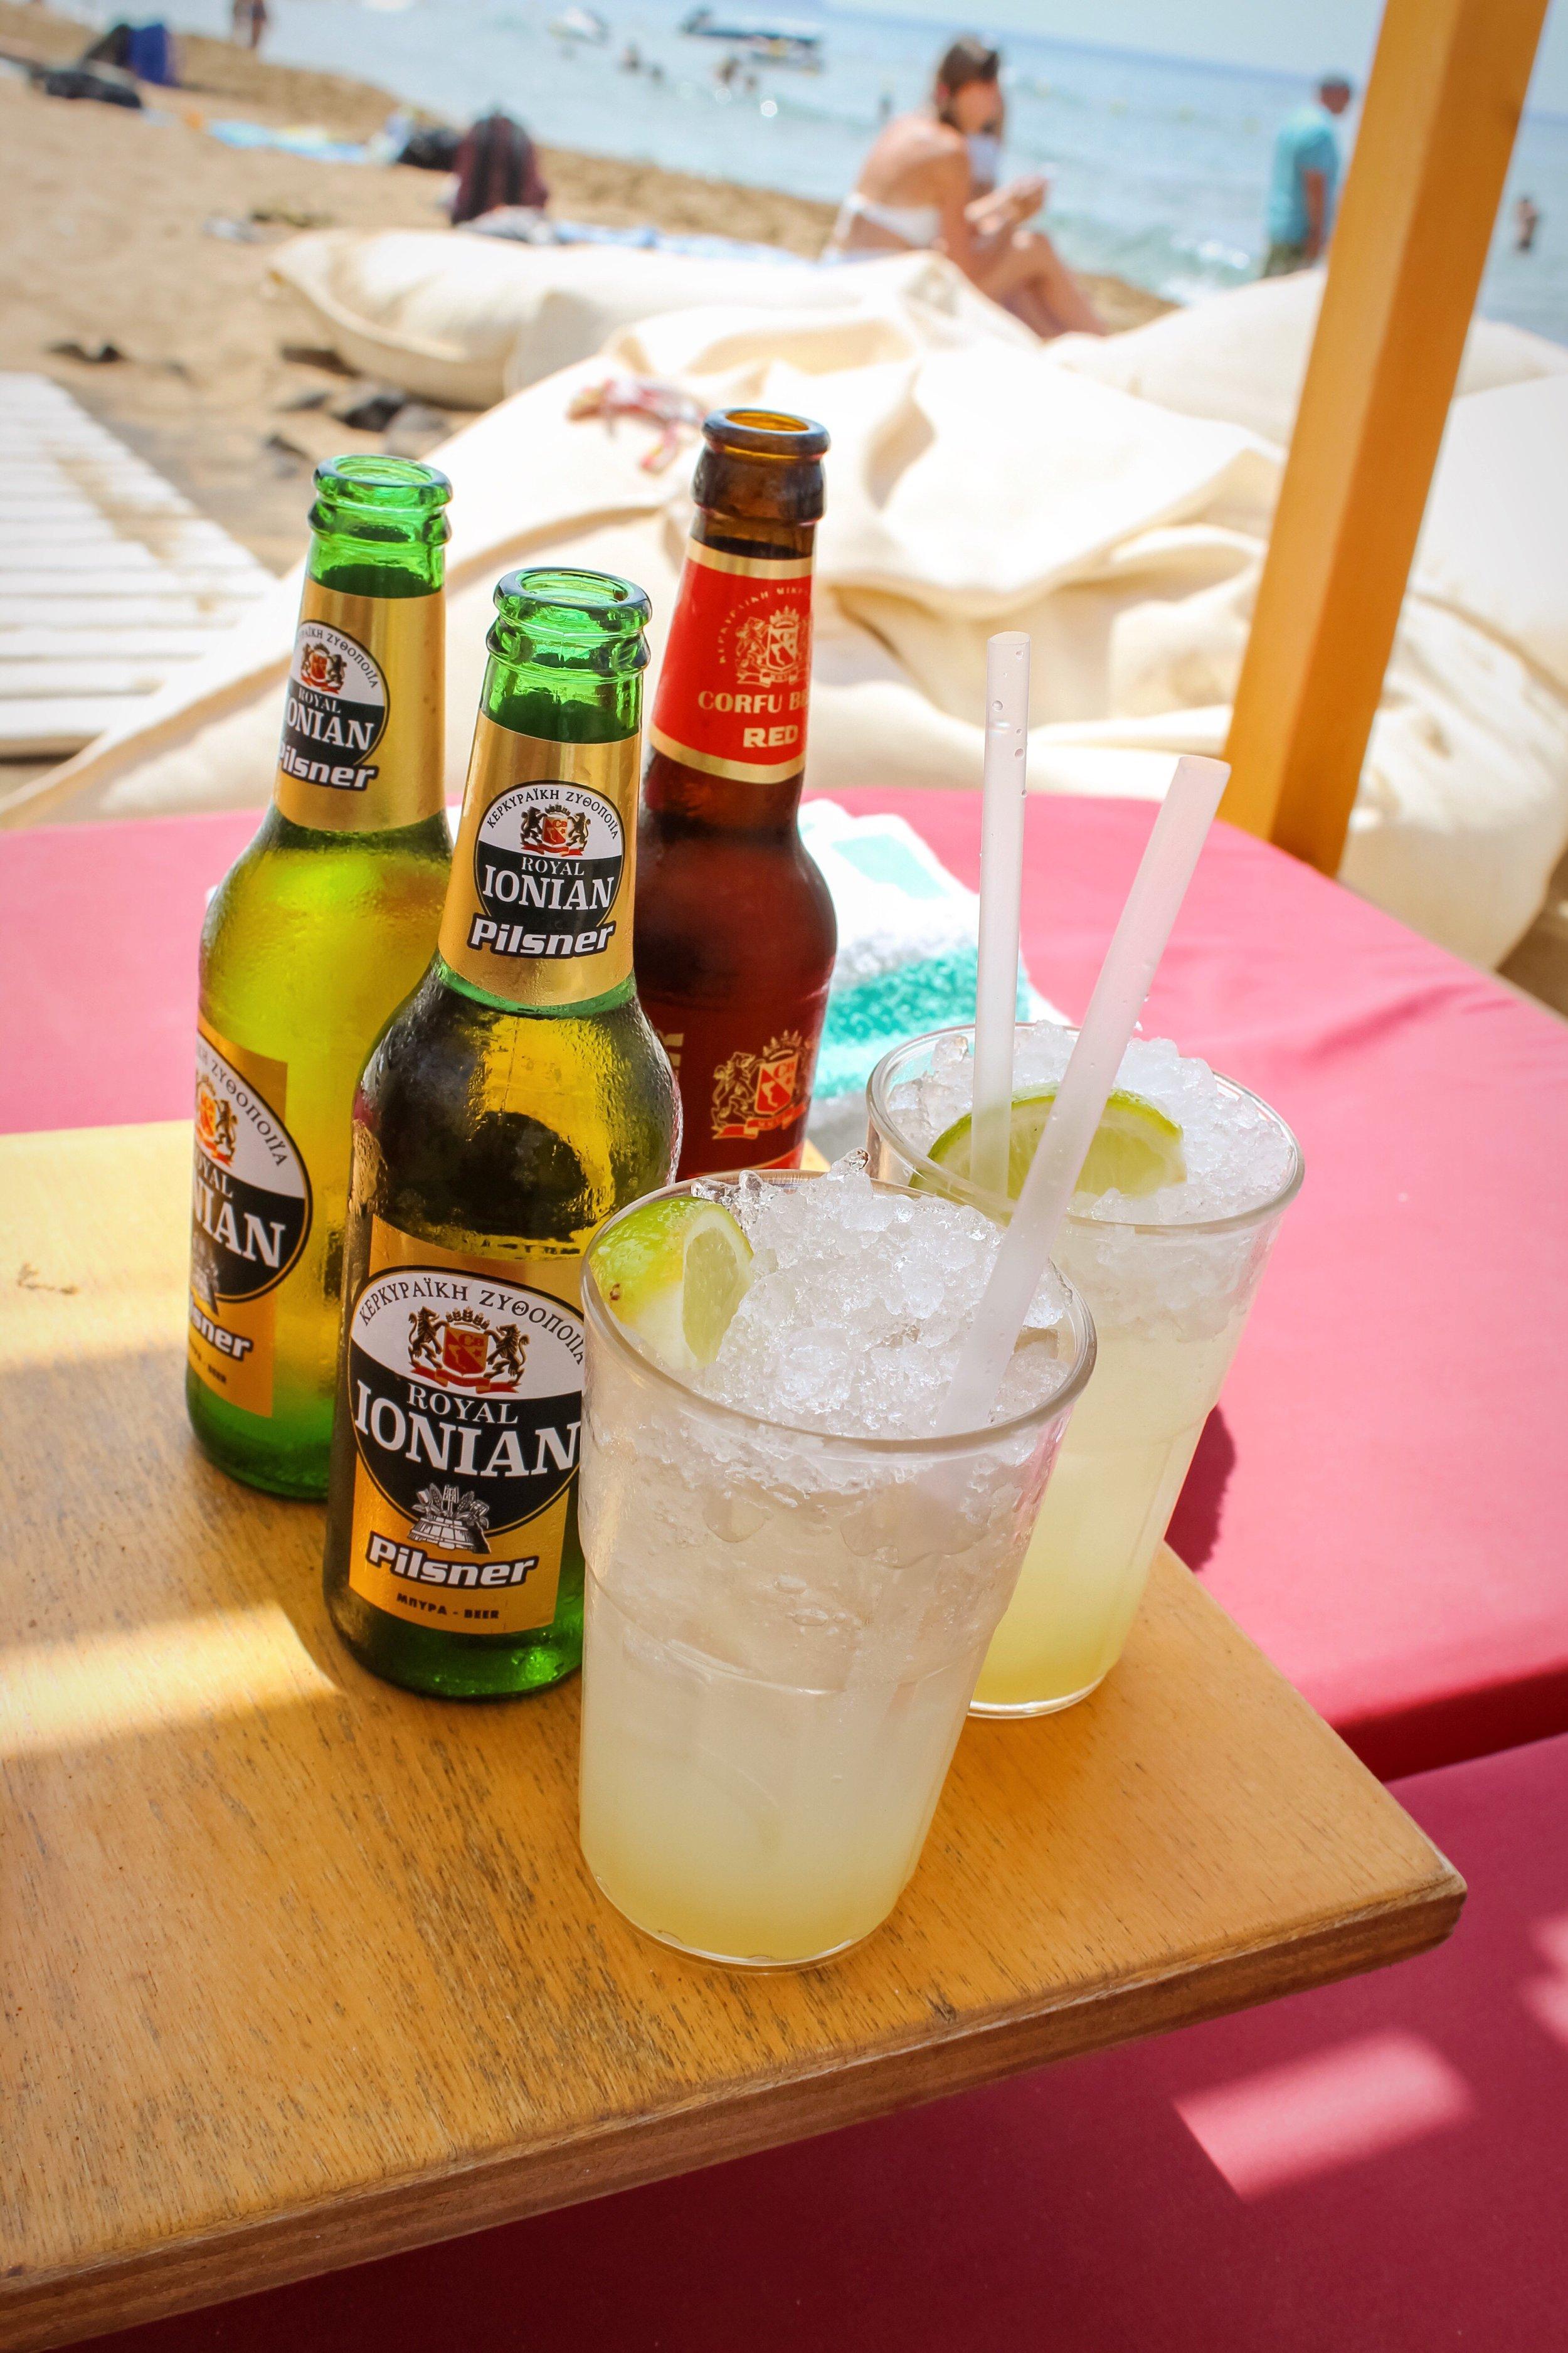 A popular drink in Corfu is ginger beer. (The ginger lemonade is good too!)